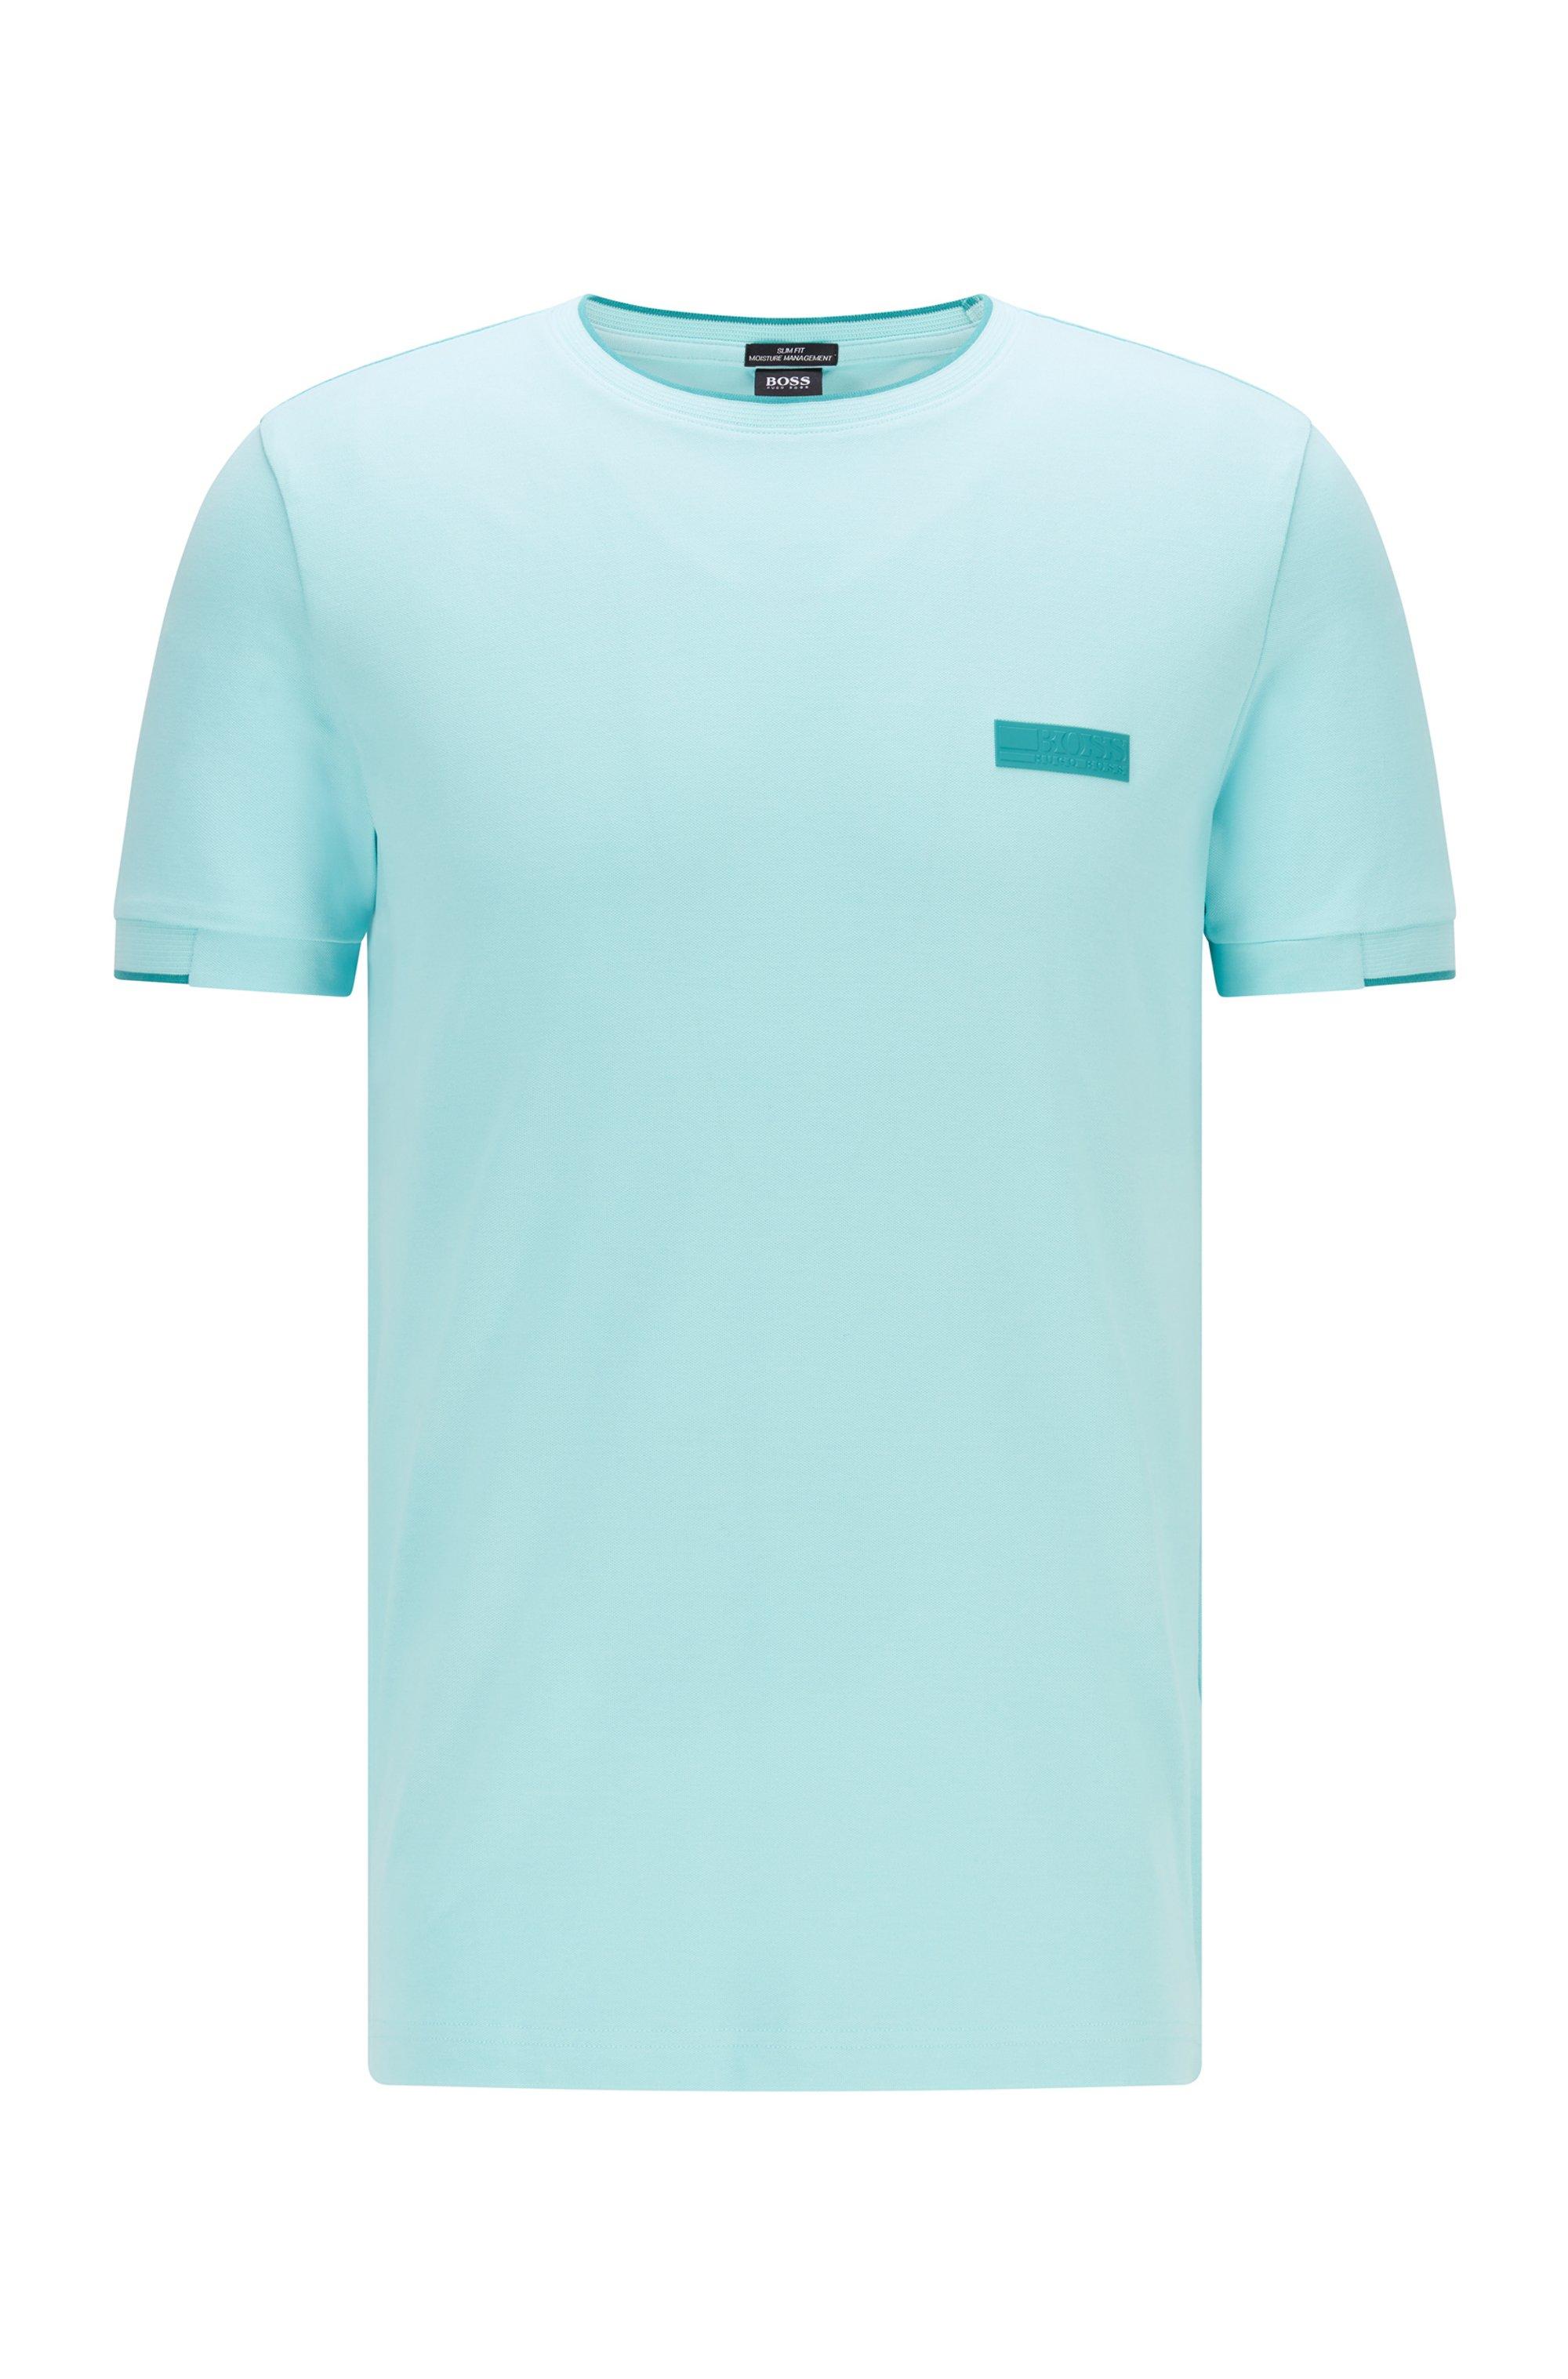 T-shirt Slim Fit avec badge logo en silicone, bleu clair